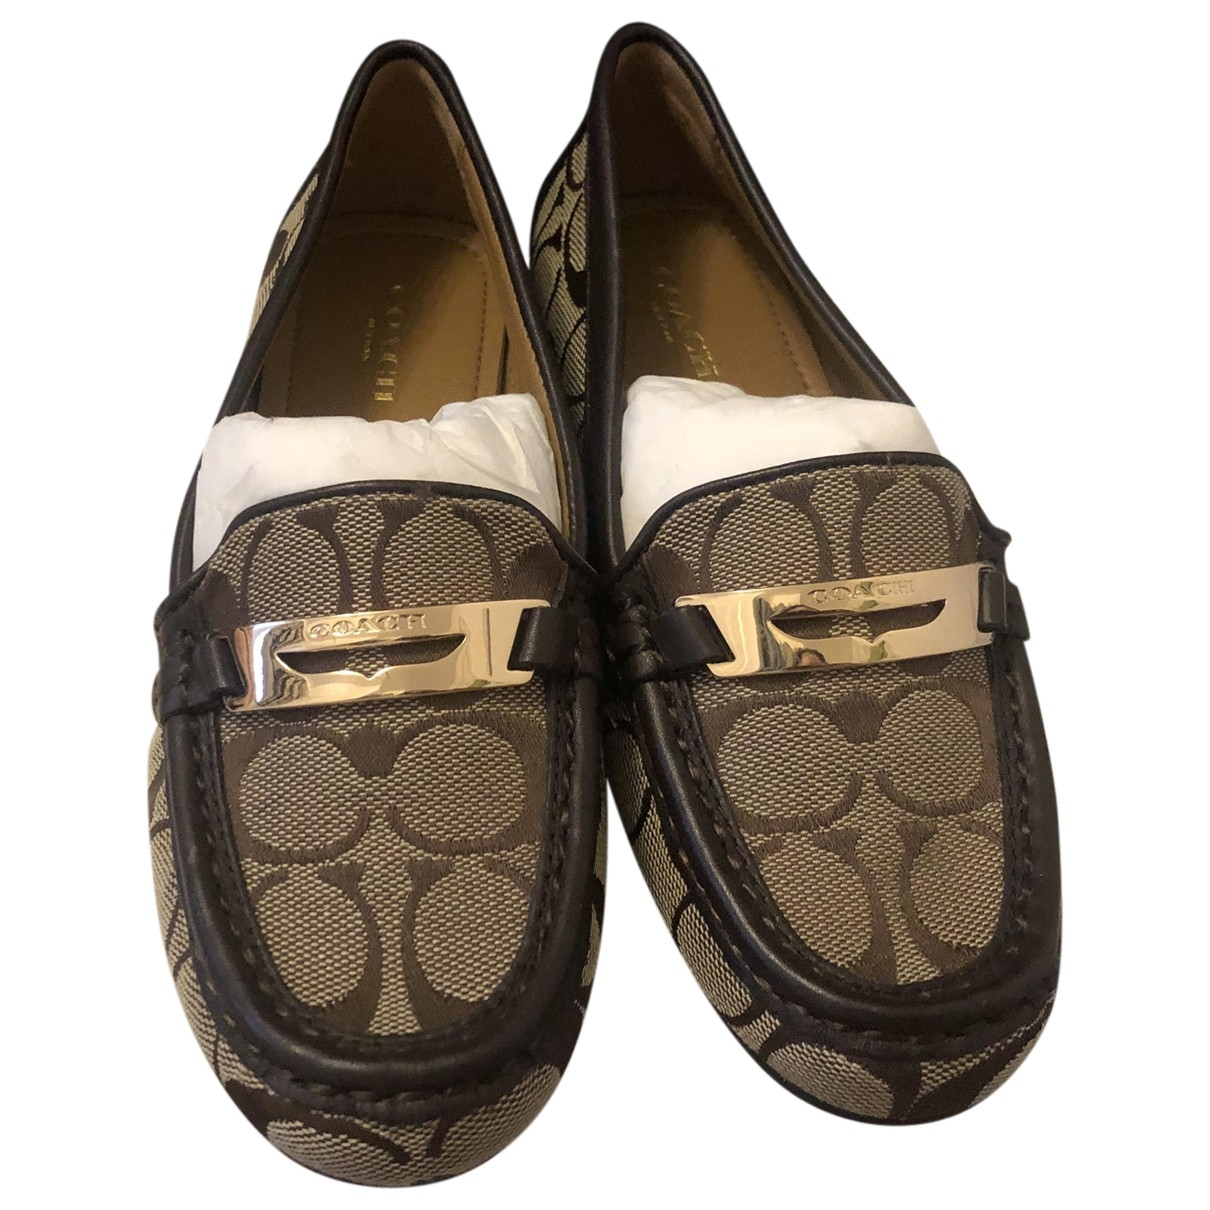 Coach \N Beige Cloth Flats for Women 35.5 EU